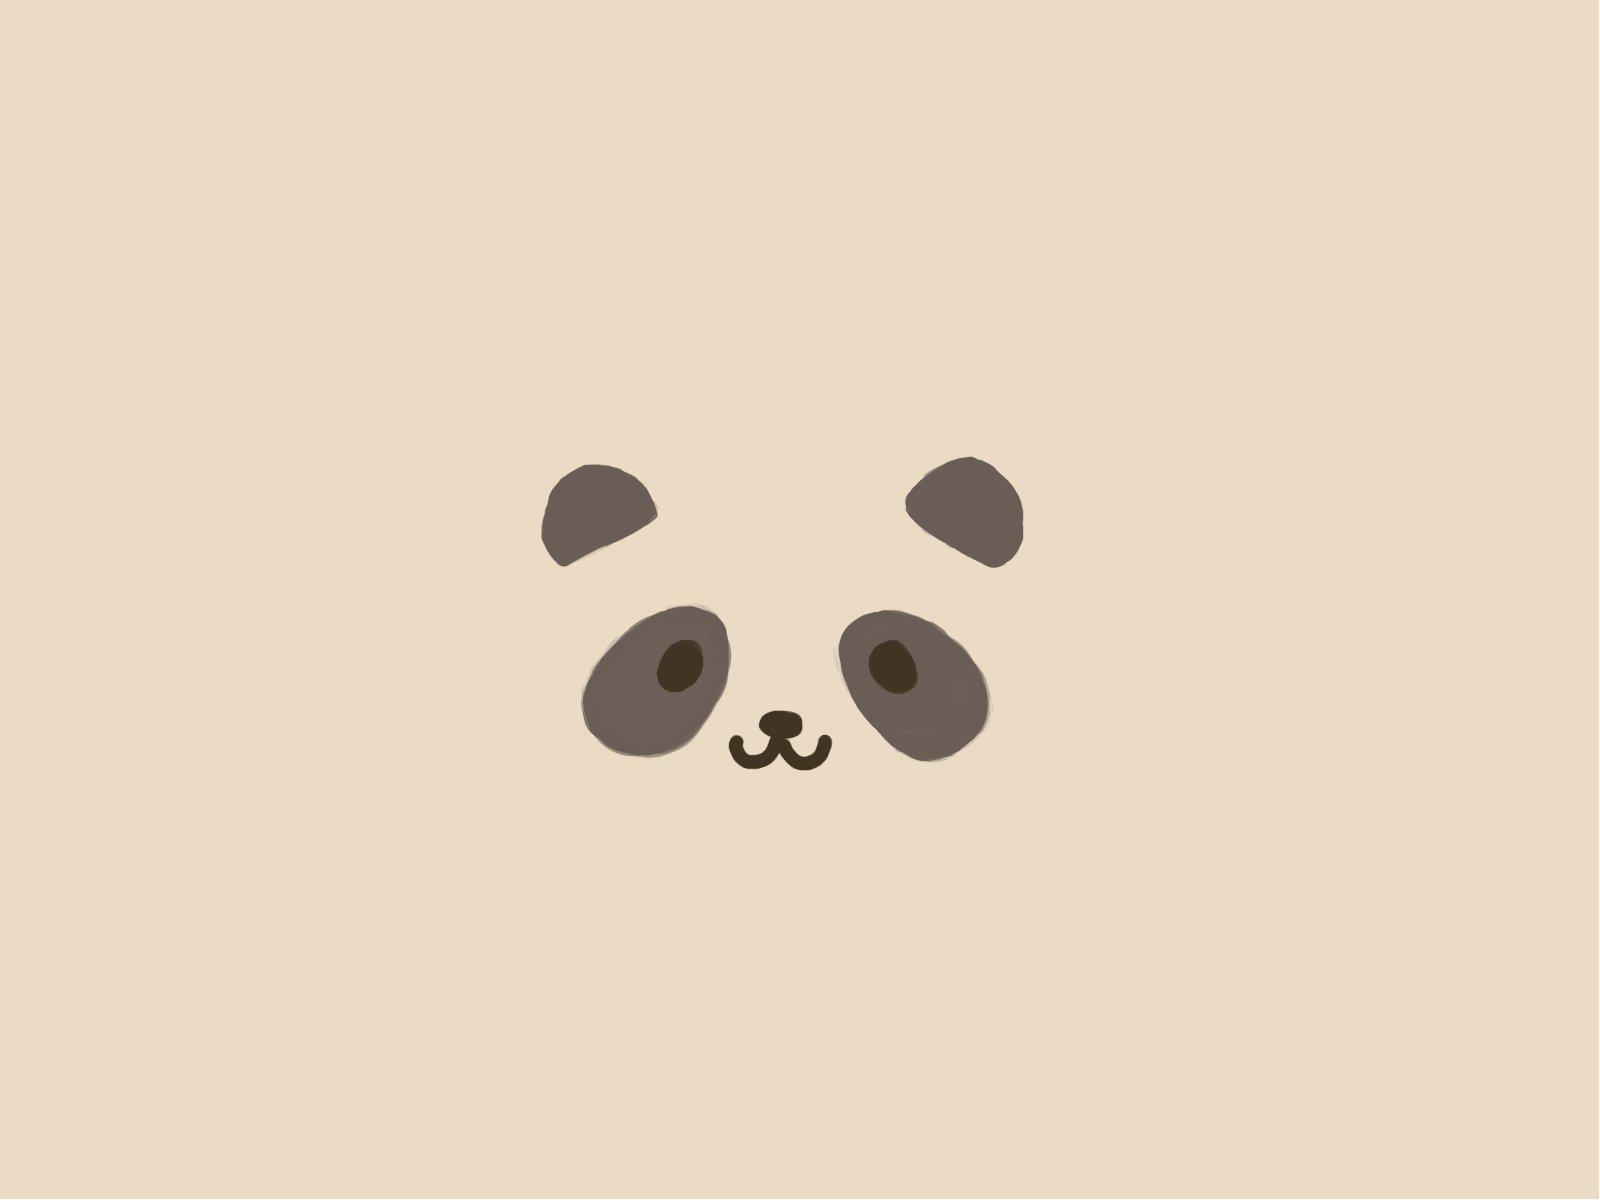 crazy pandalism panda wallpaper 1600x1200